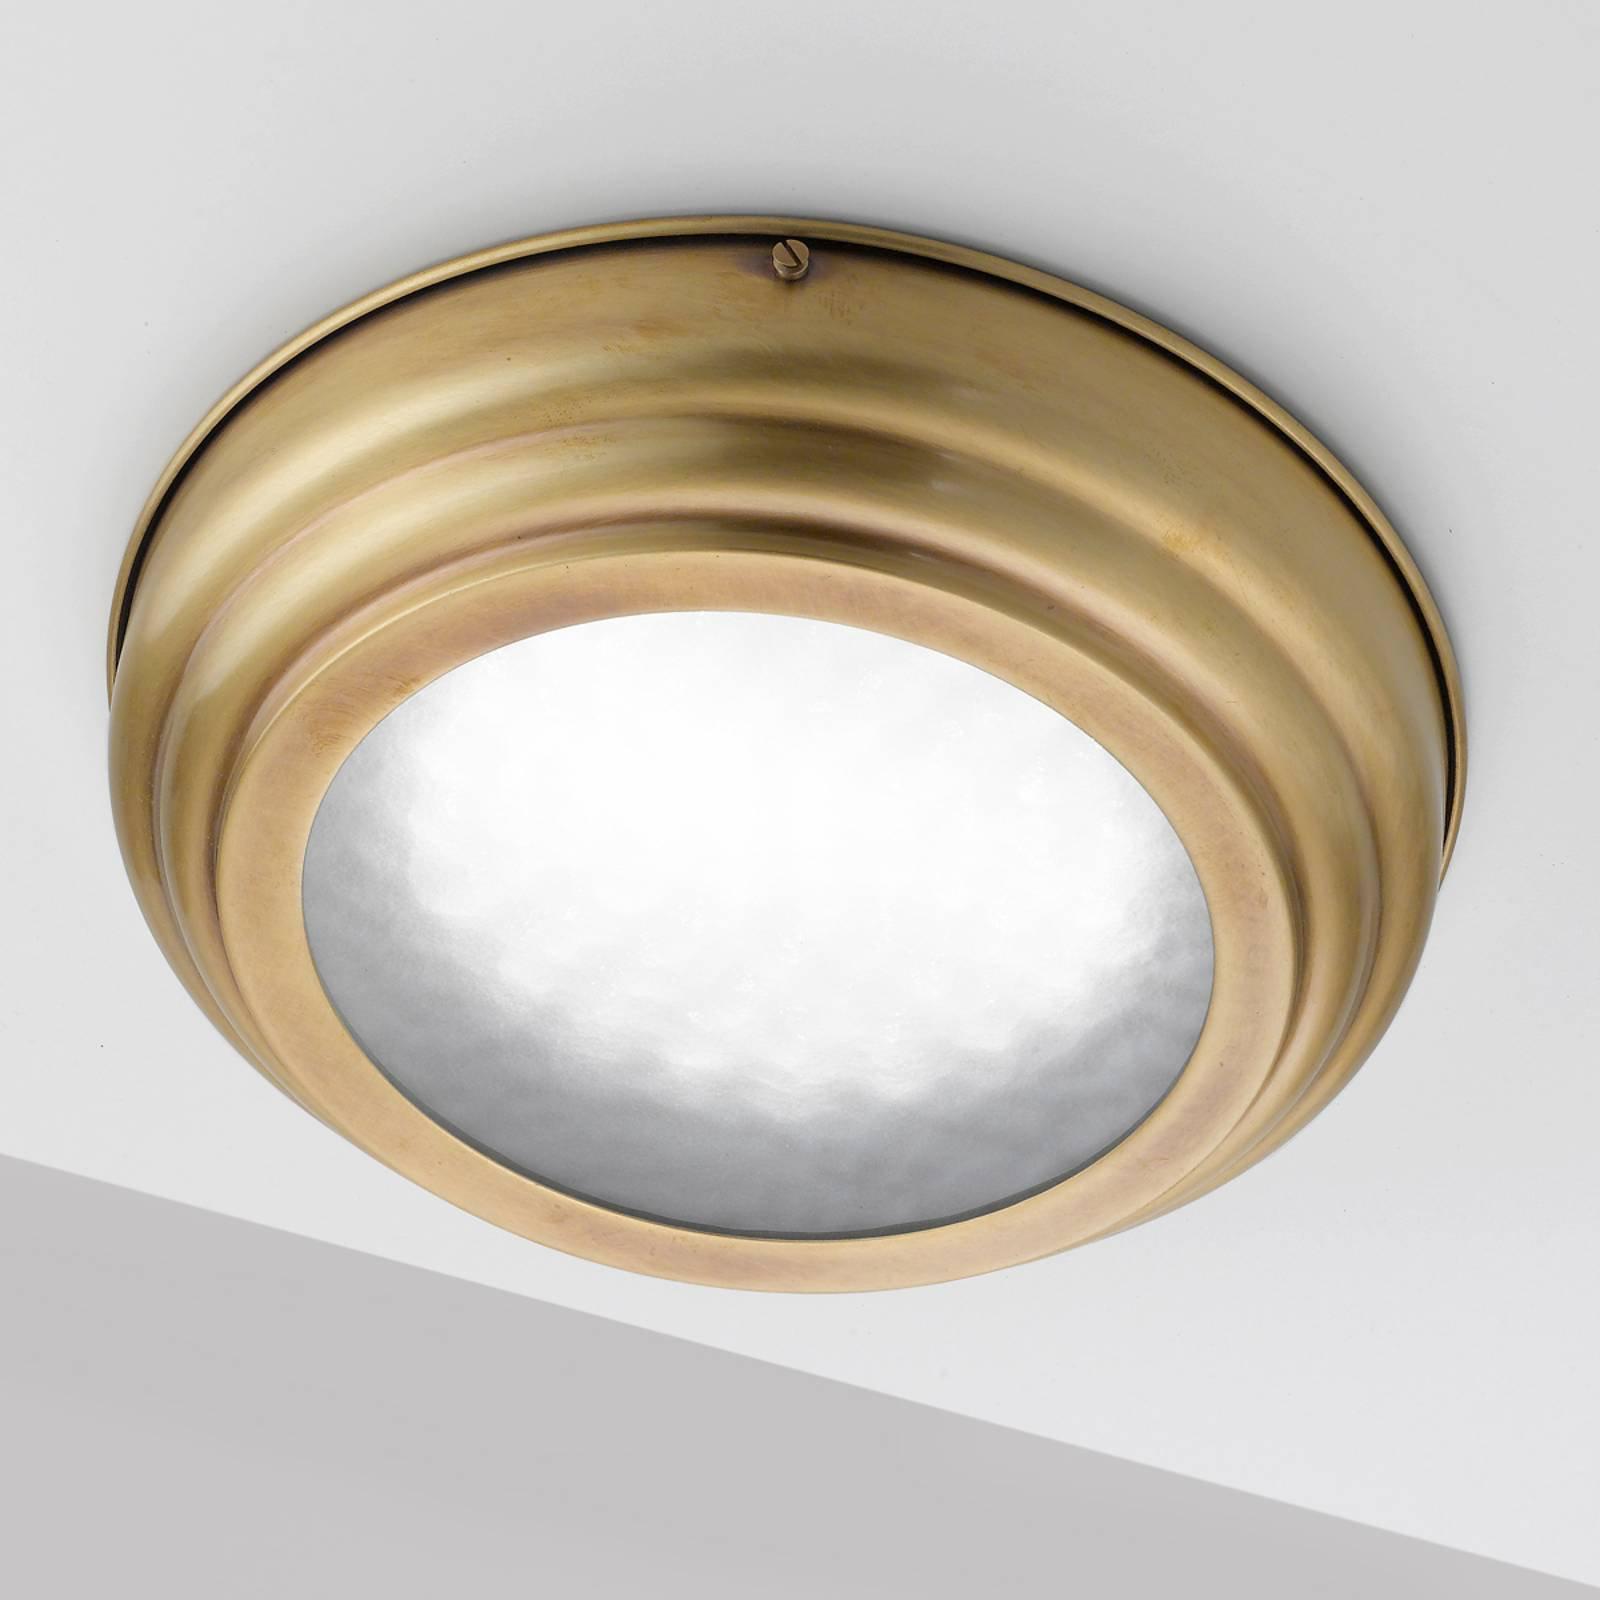 LED-taklampe Scirocco 39cm, messing satinert